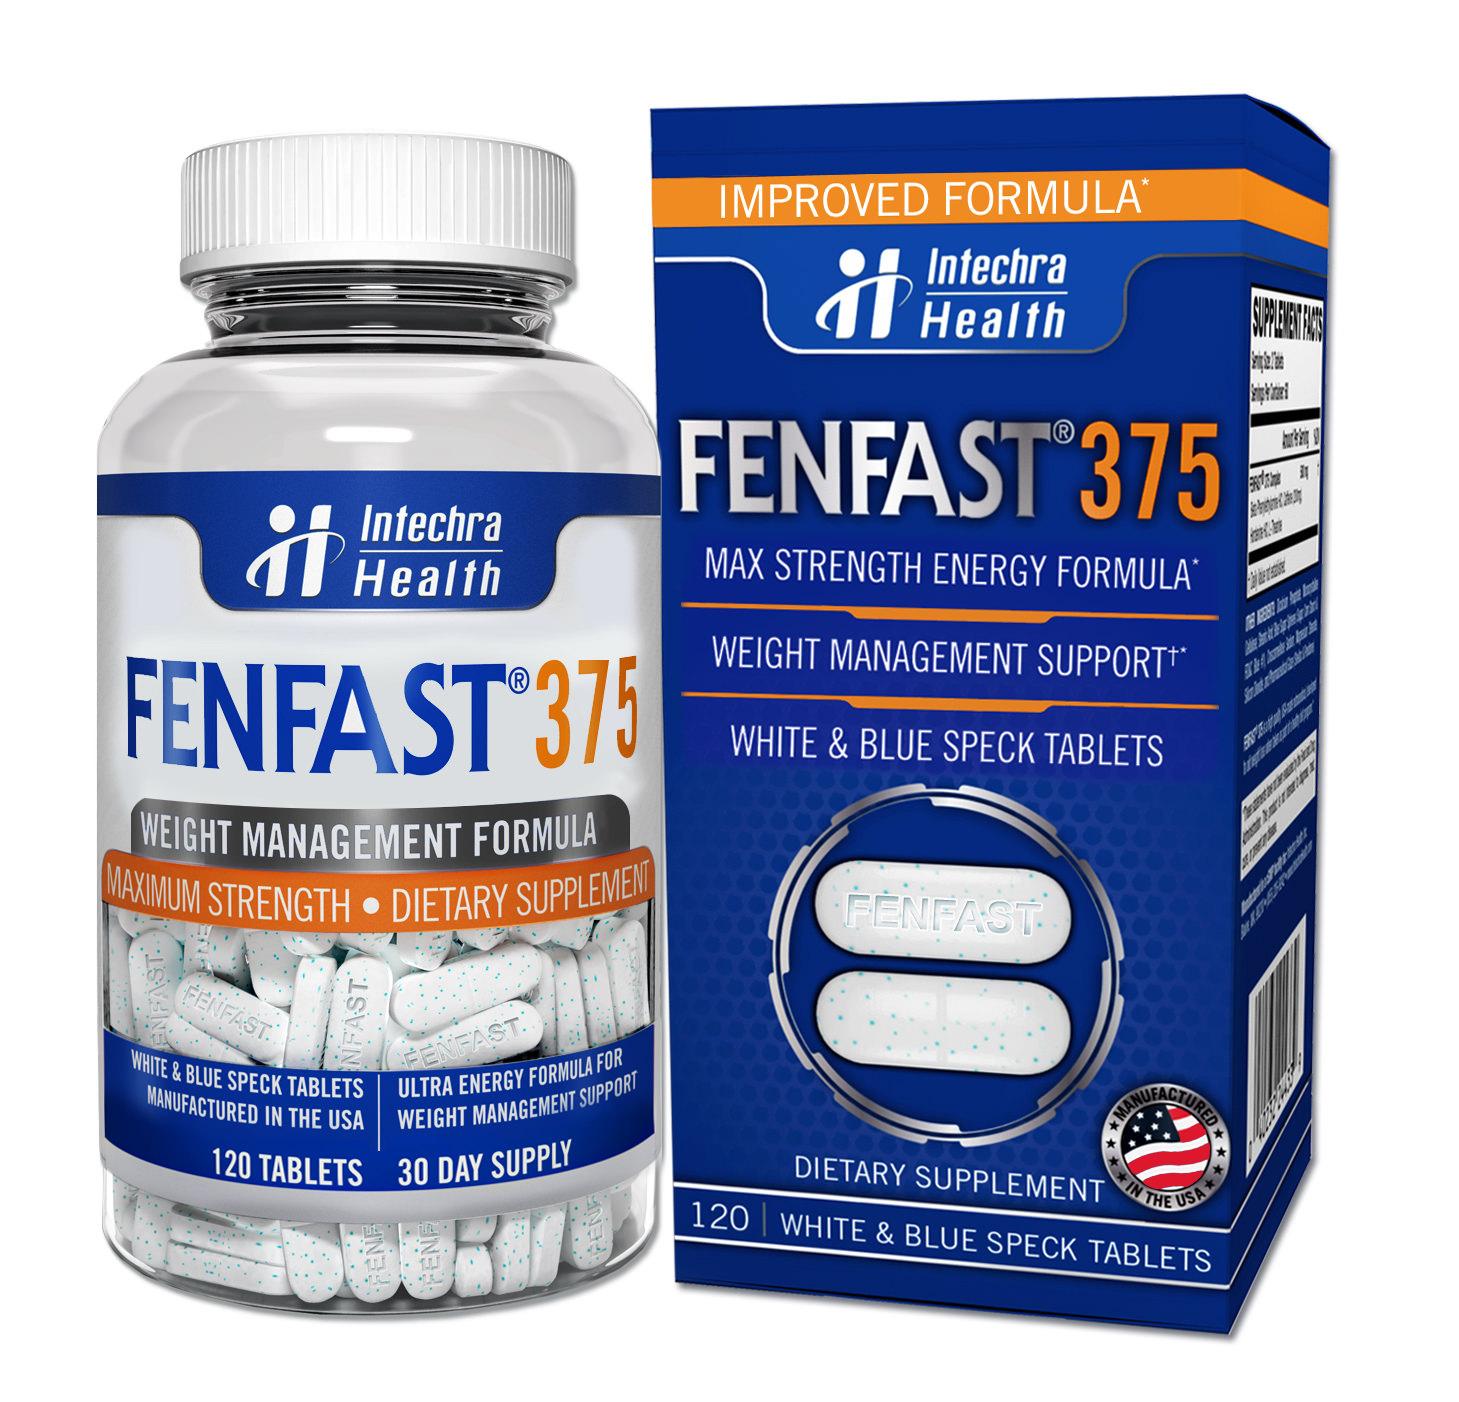 FENFAST 375 Maximum Strength Dietary Supplement, Weight Management Formula, 120 Count